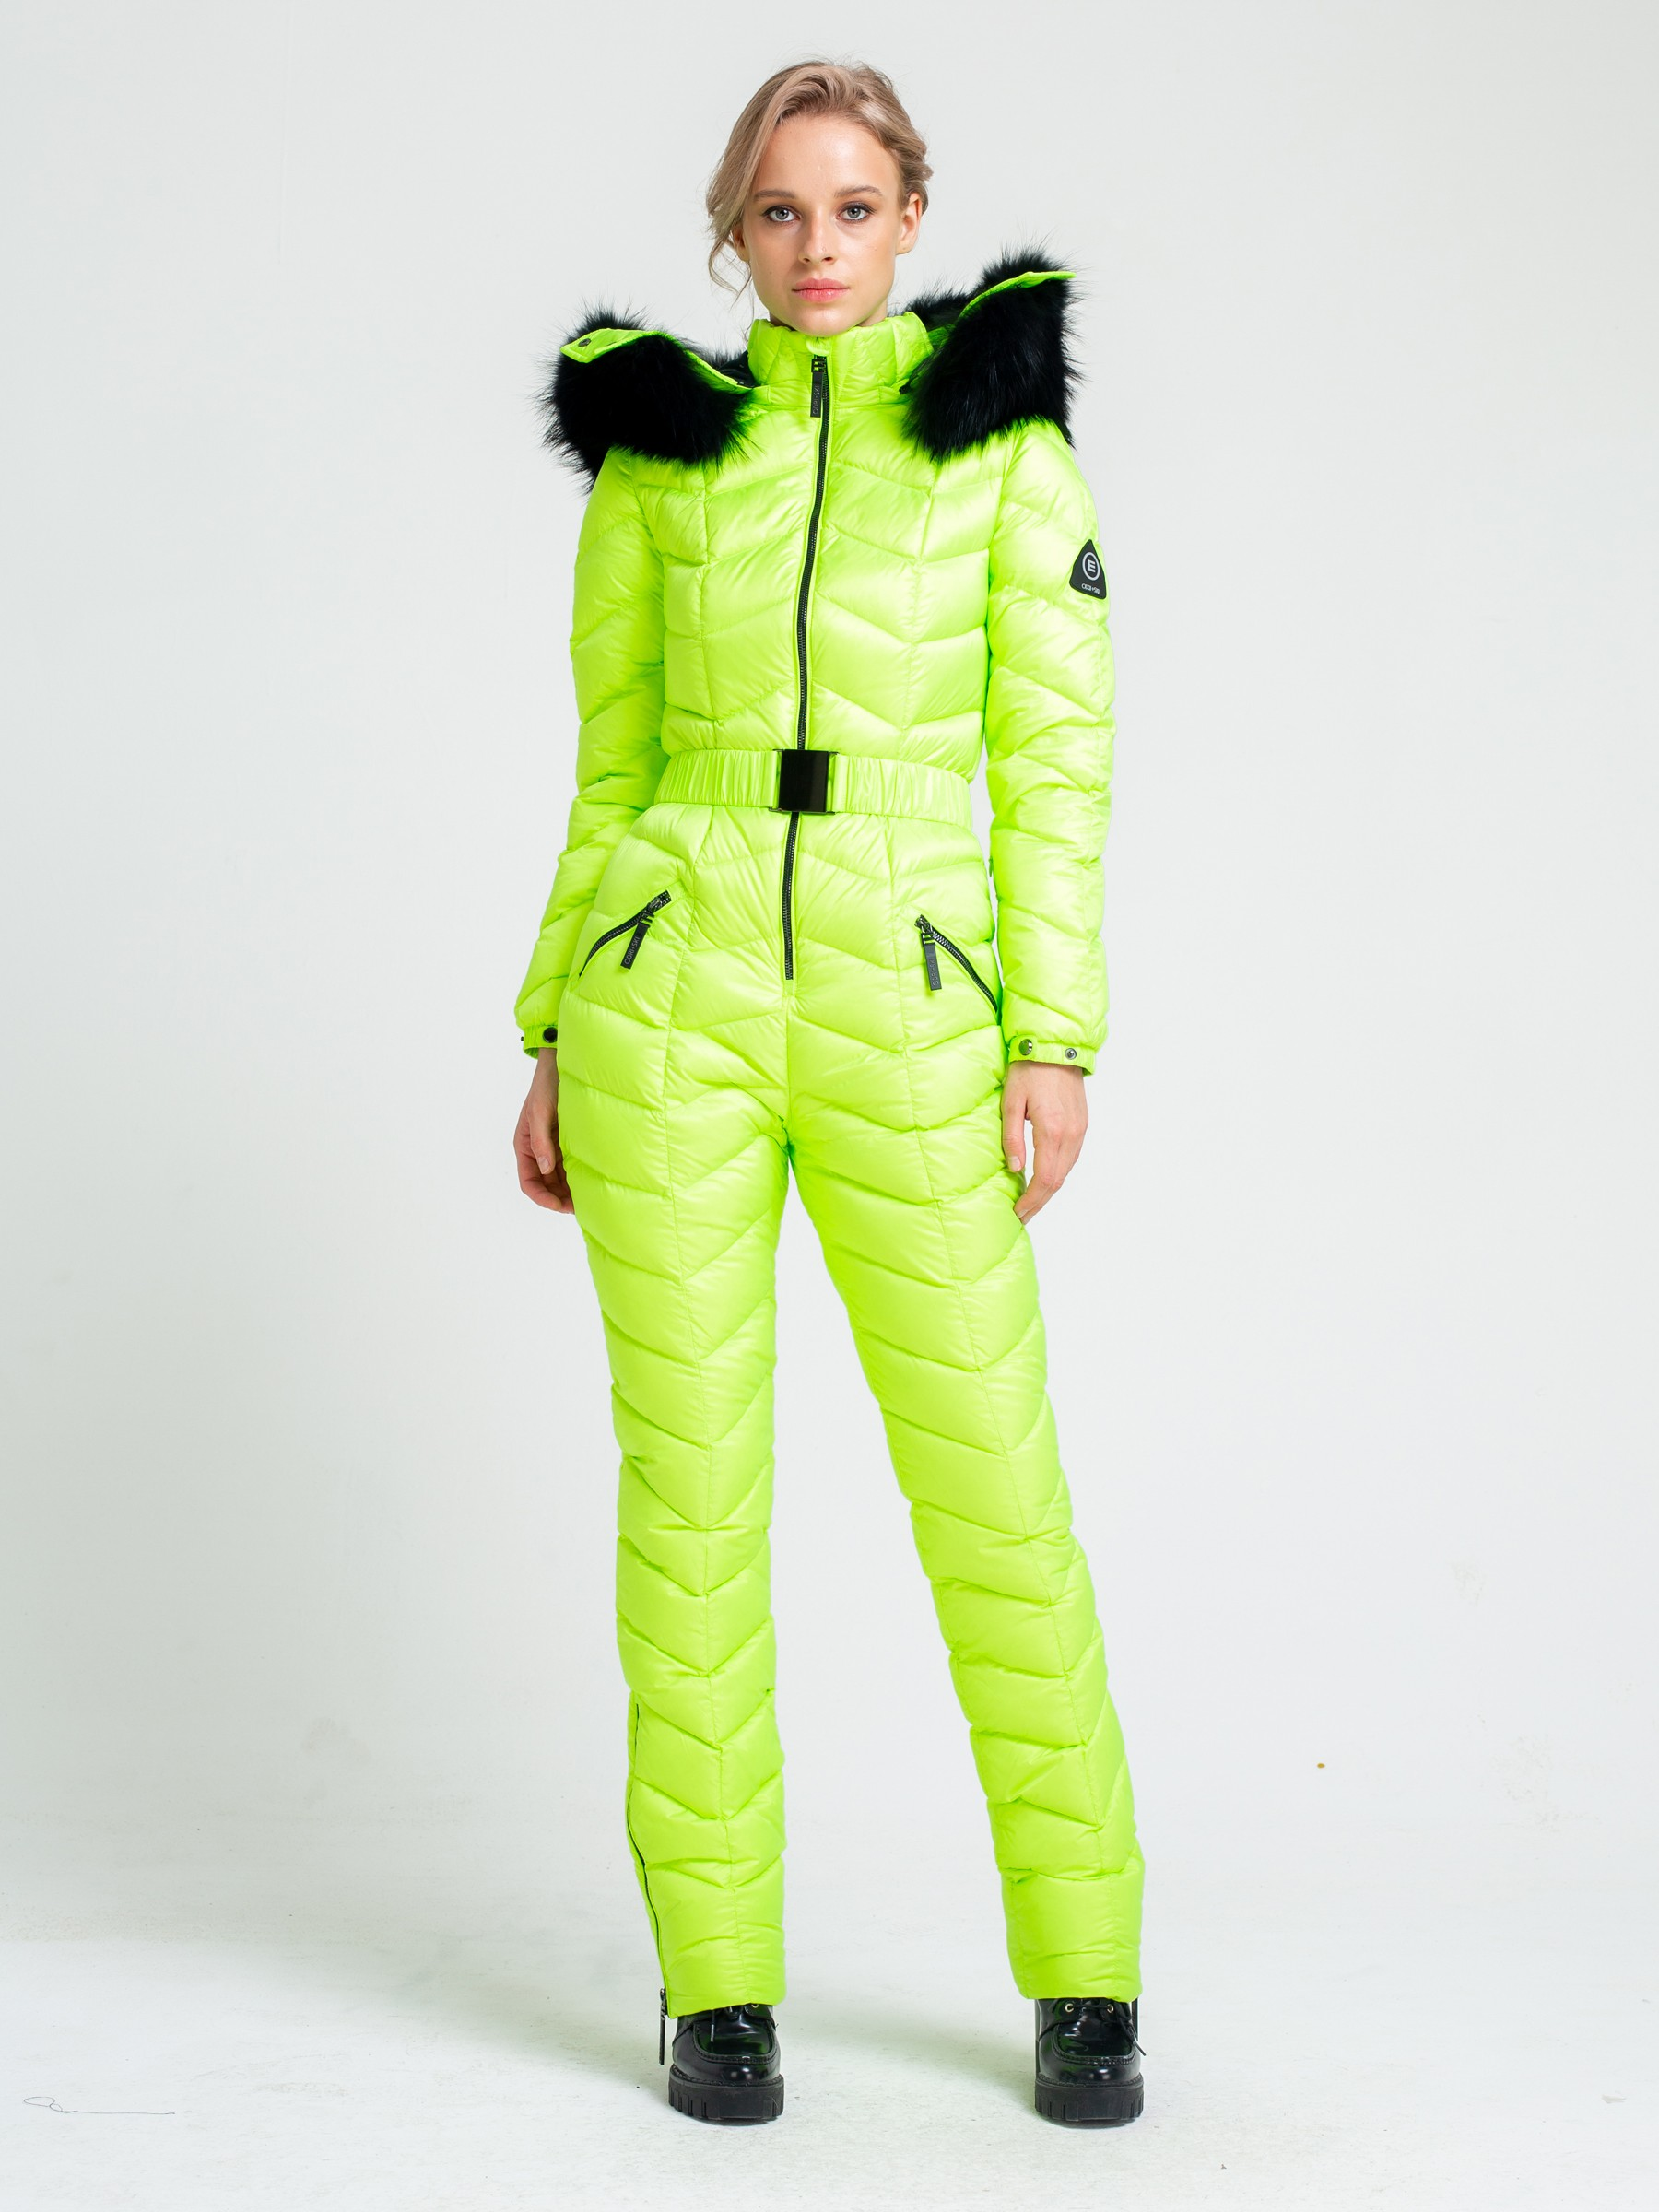 Odri Kombinezon Narciarski Lumi Lime Catwalk Spółka Z O O